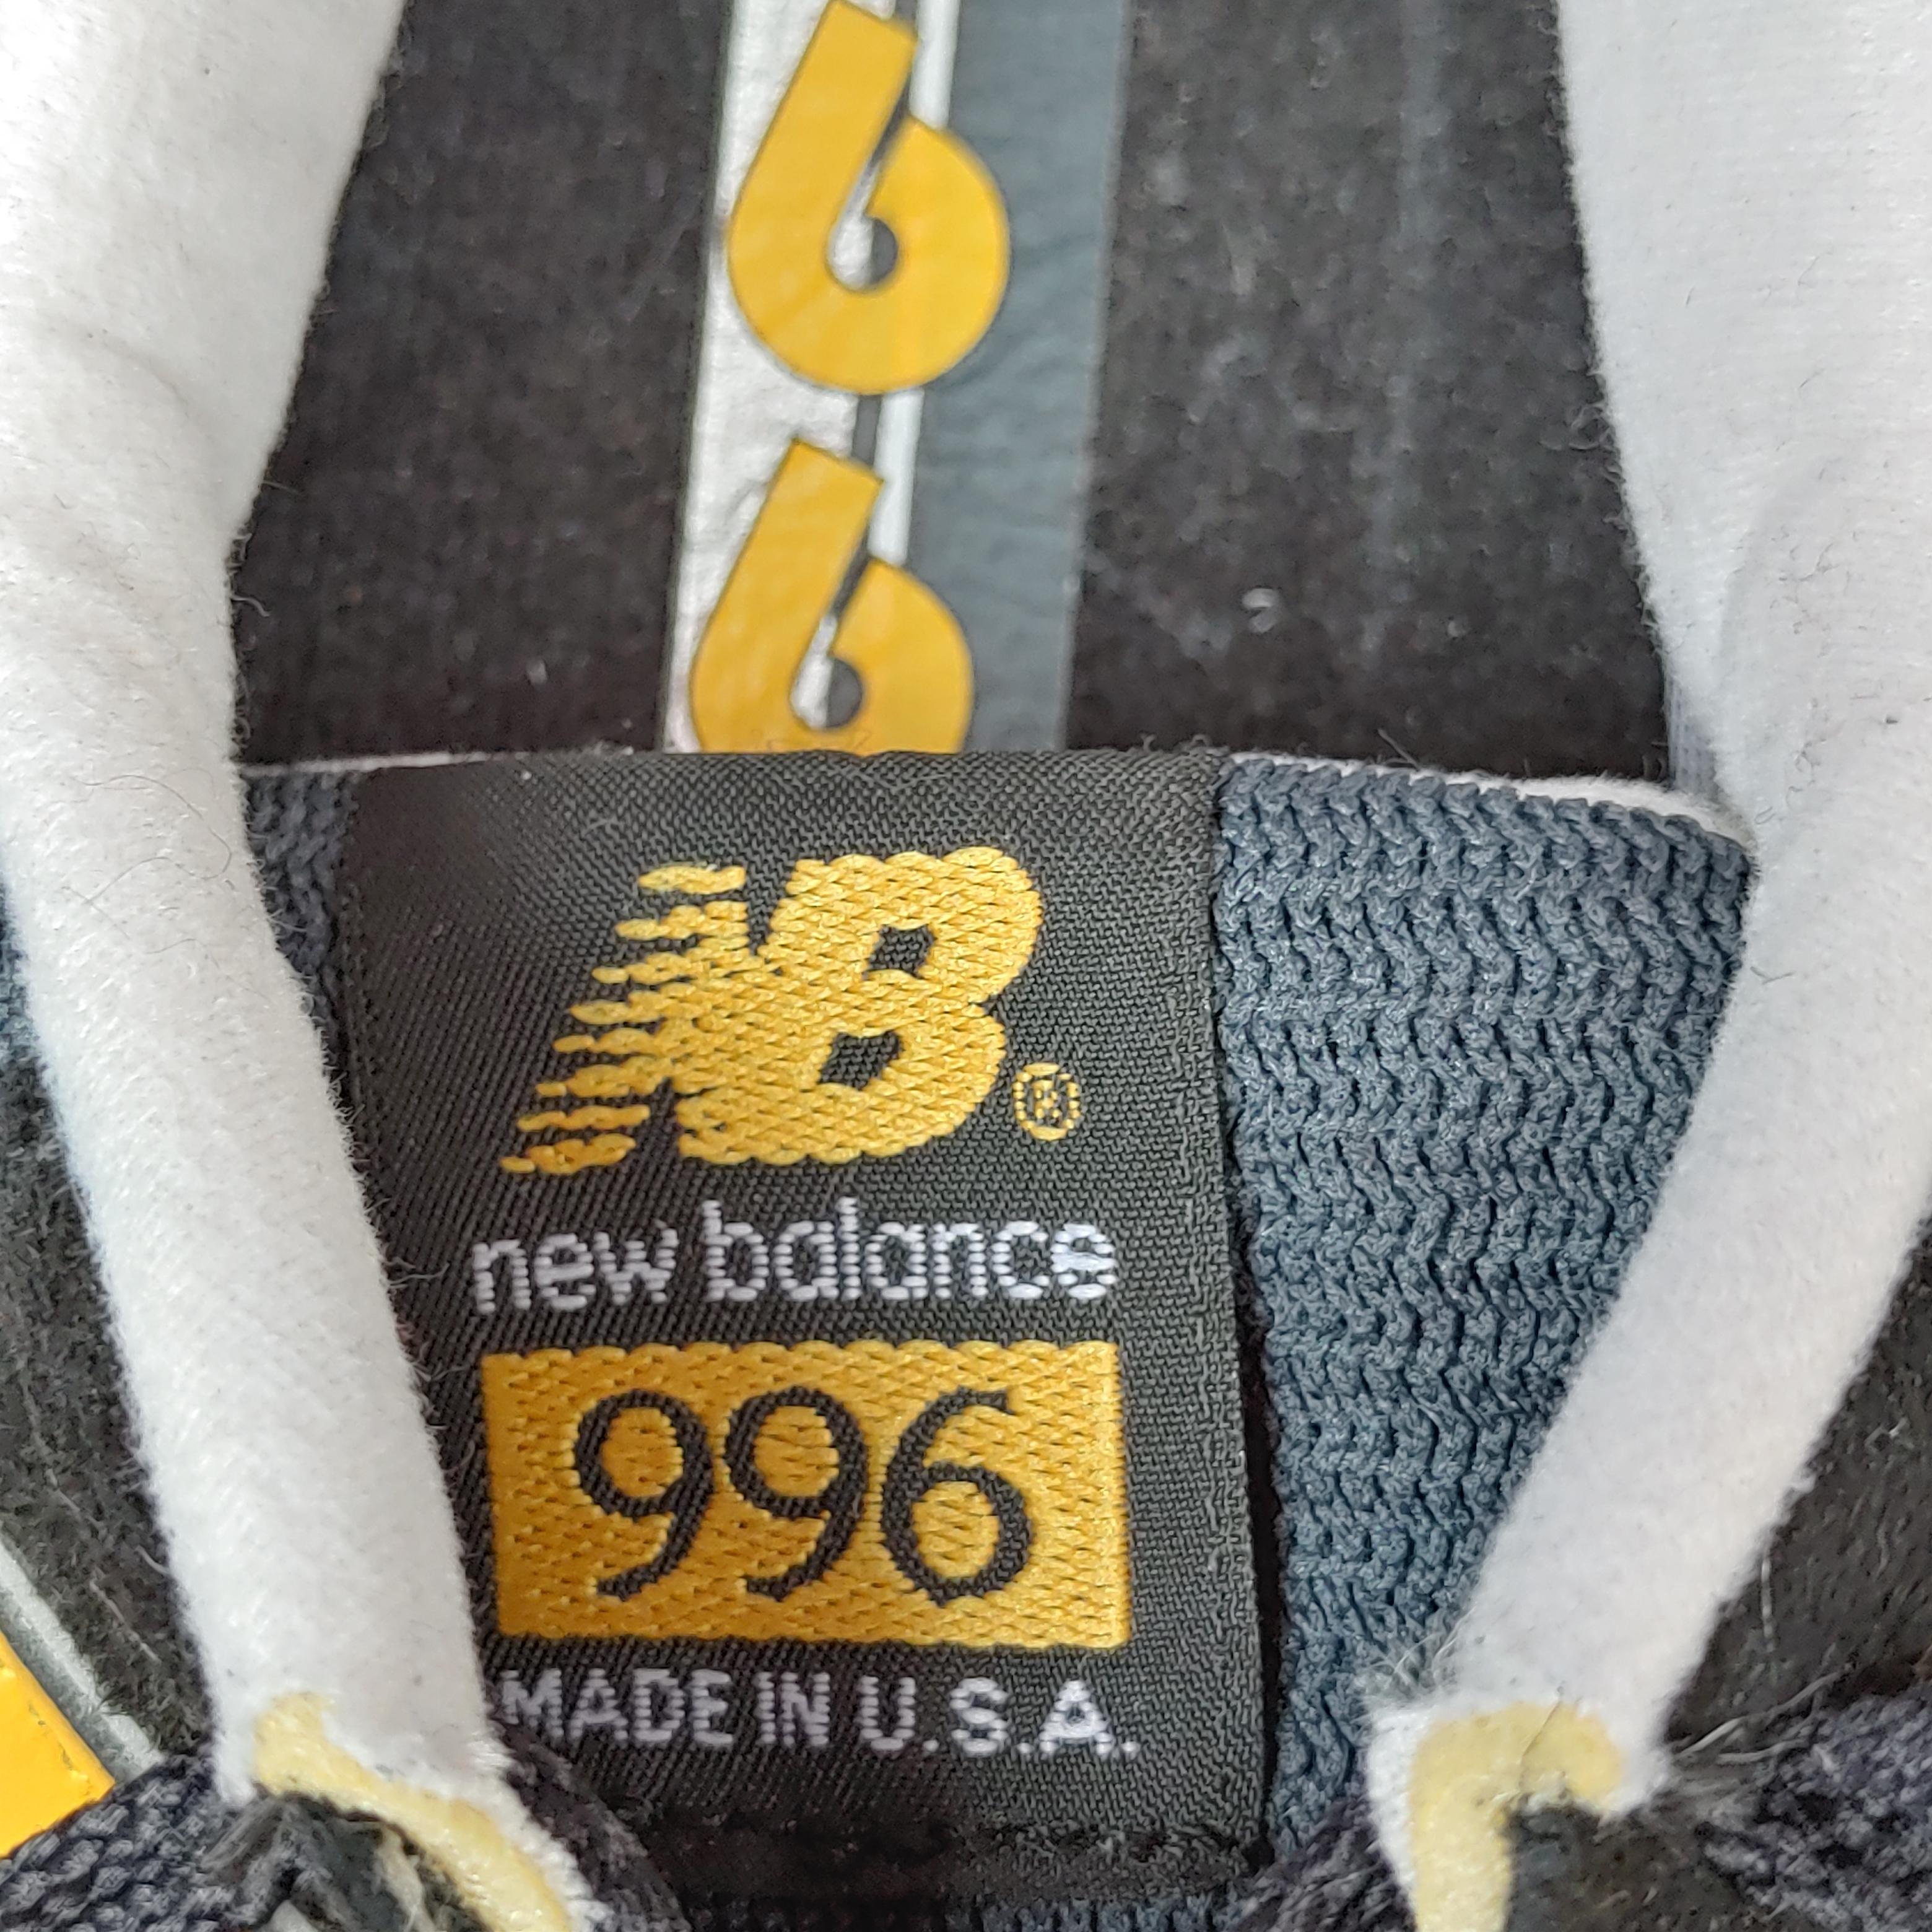 【USA】NEW BALANCE 996 US6.5(24.5cm)